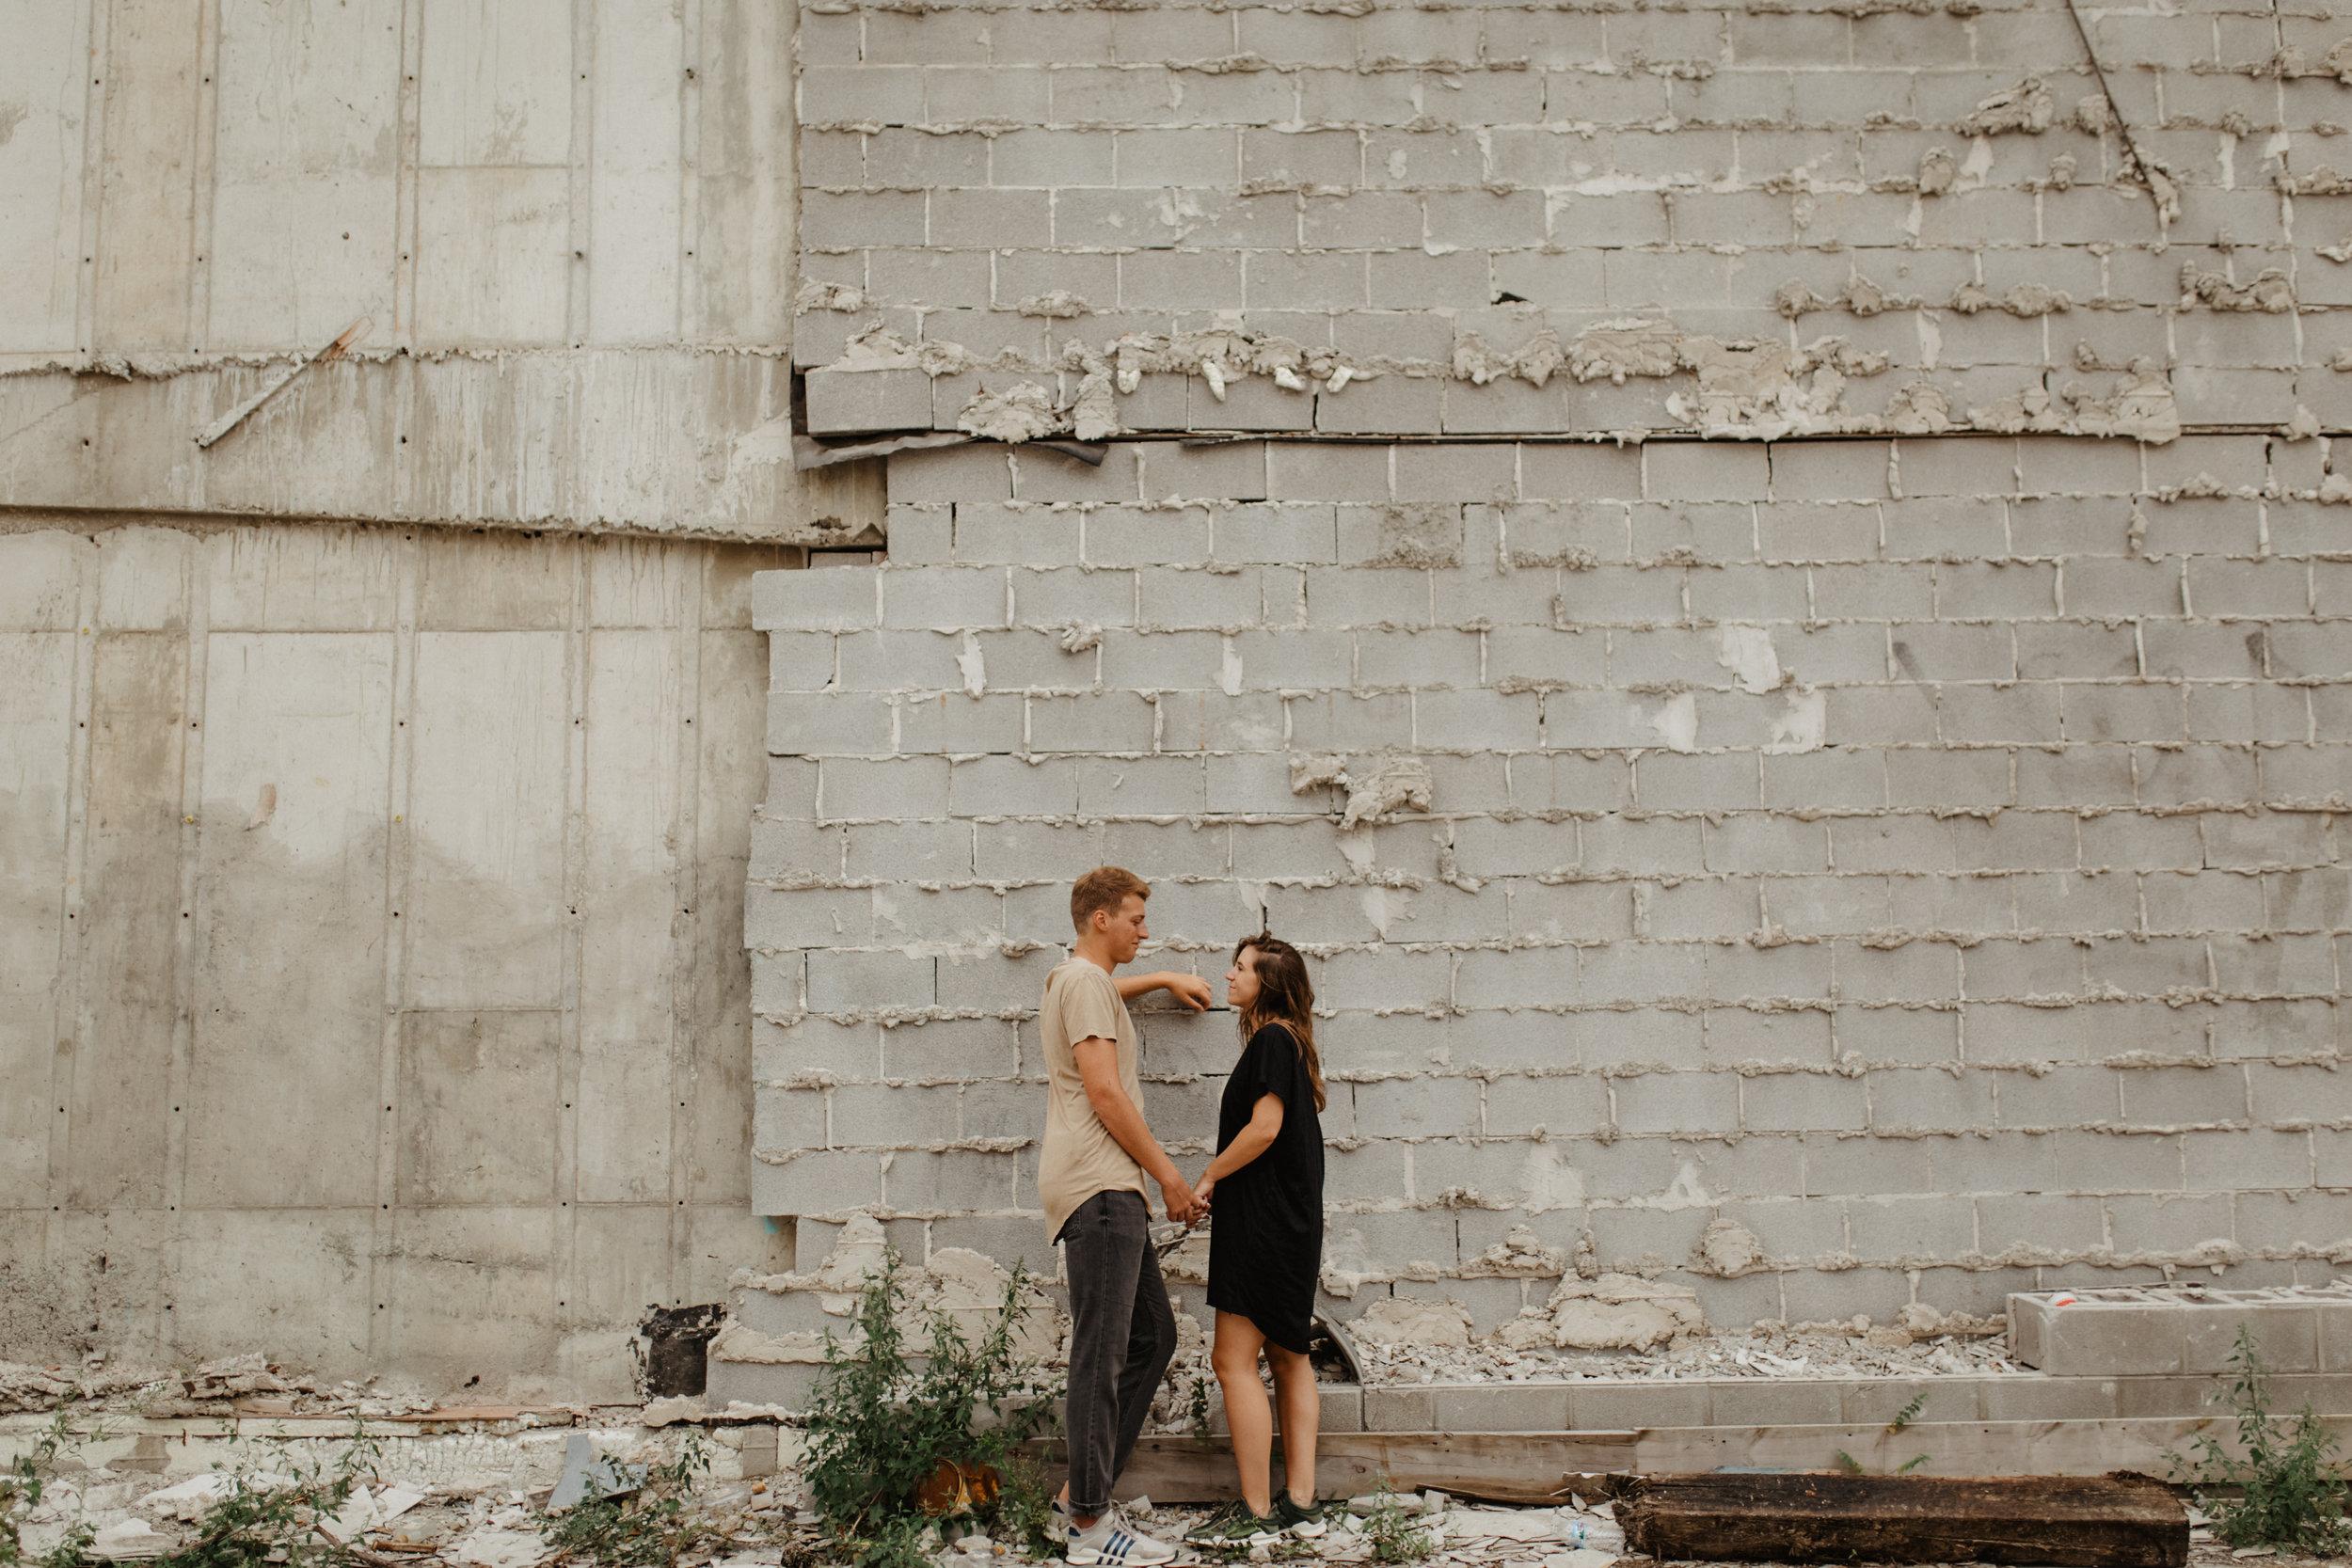 Taryn-Zak-Urban-City-Engagement-8